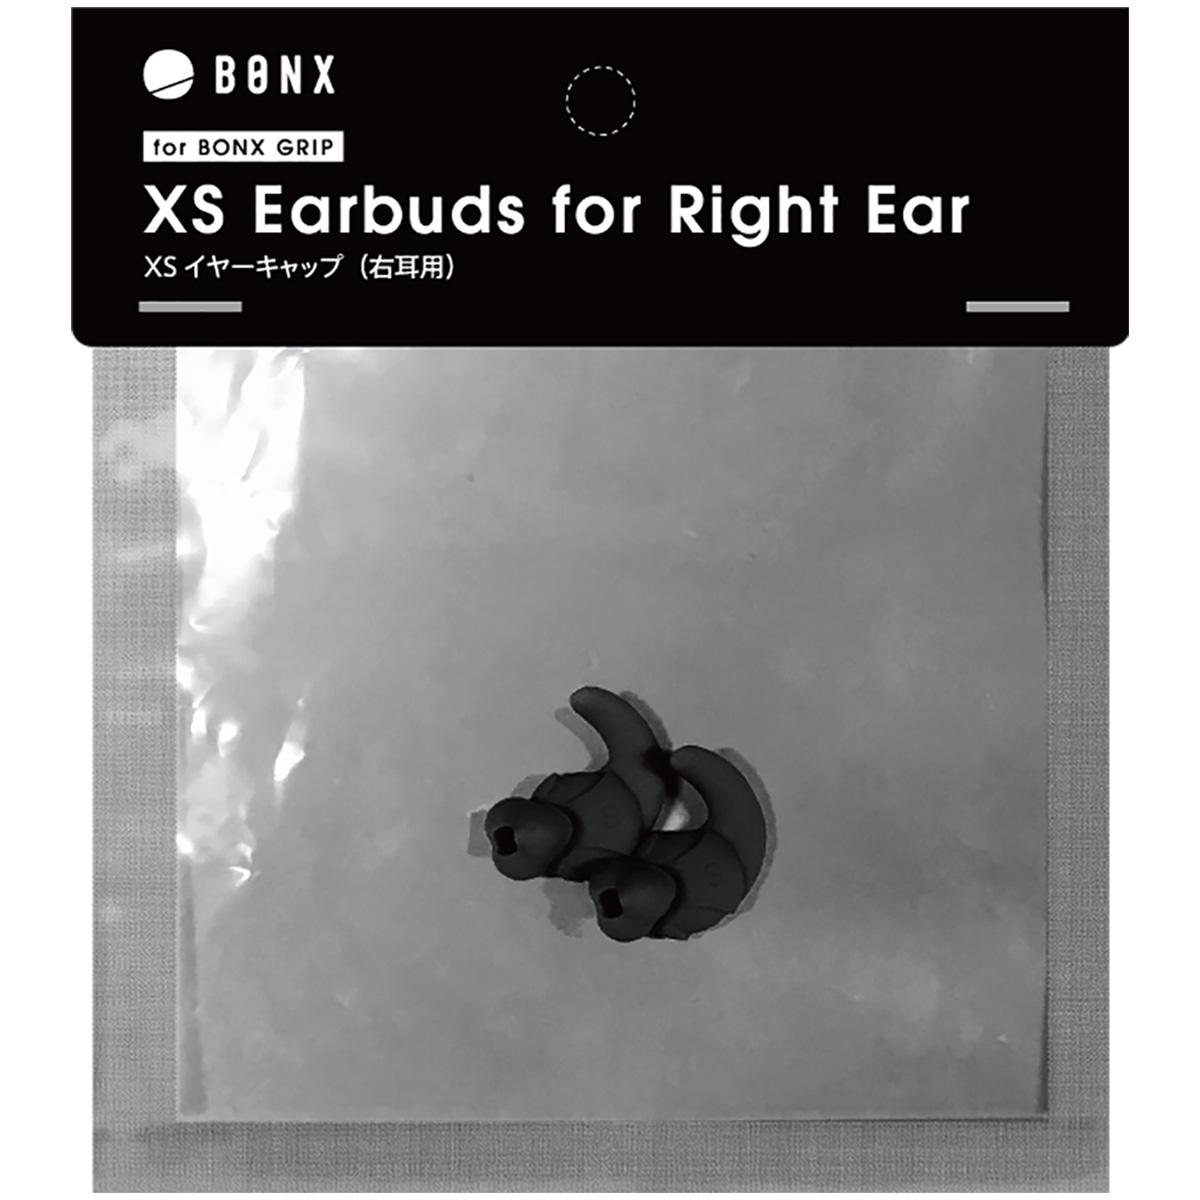 BONX Grip 右耳イヤーキャップ XS